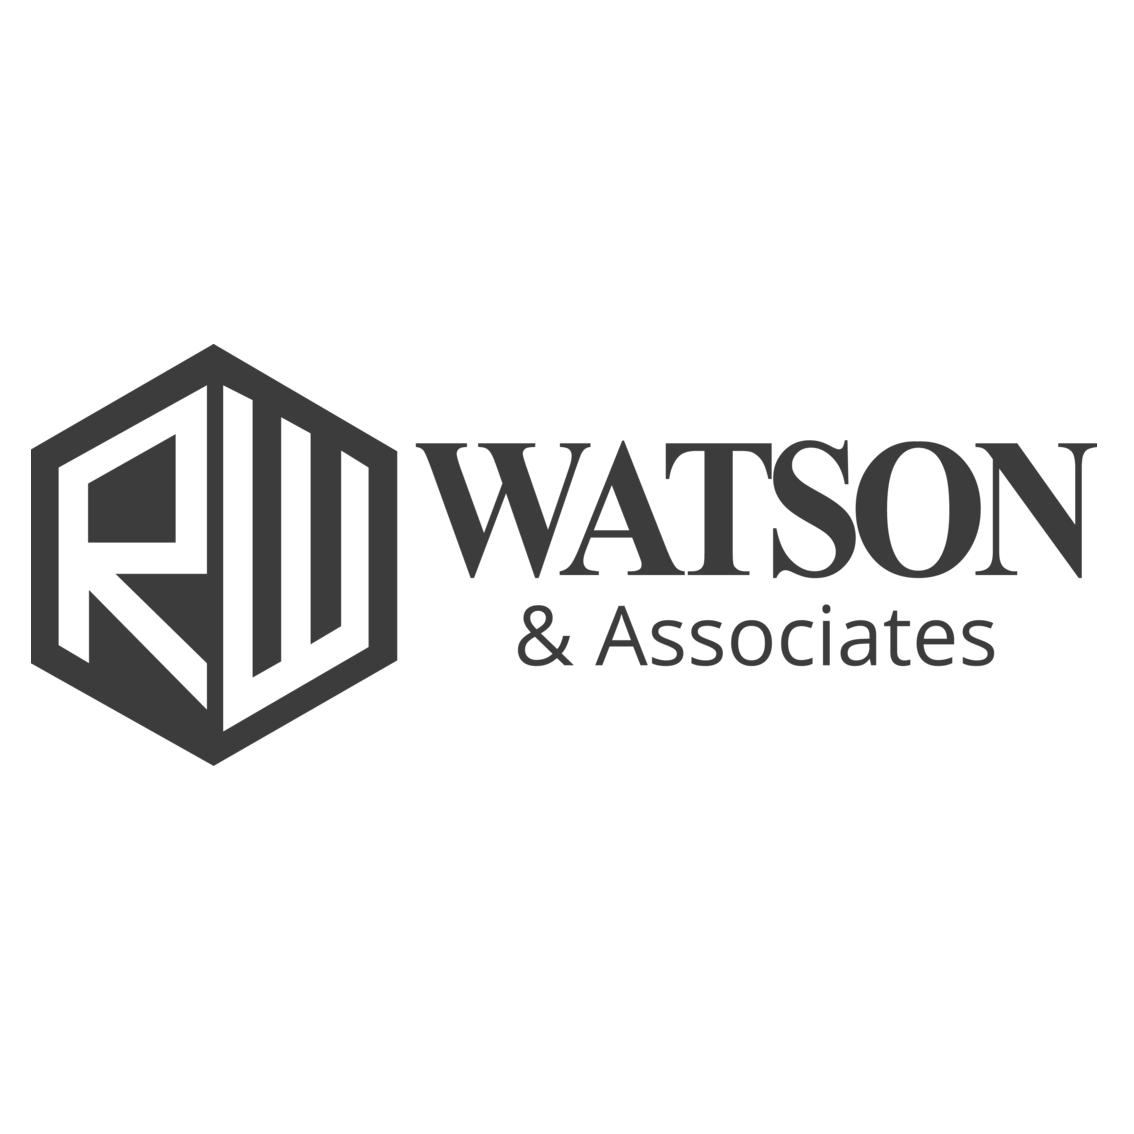 RW Watson, Broker Associate | Keller Williams